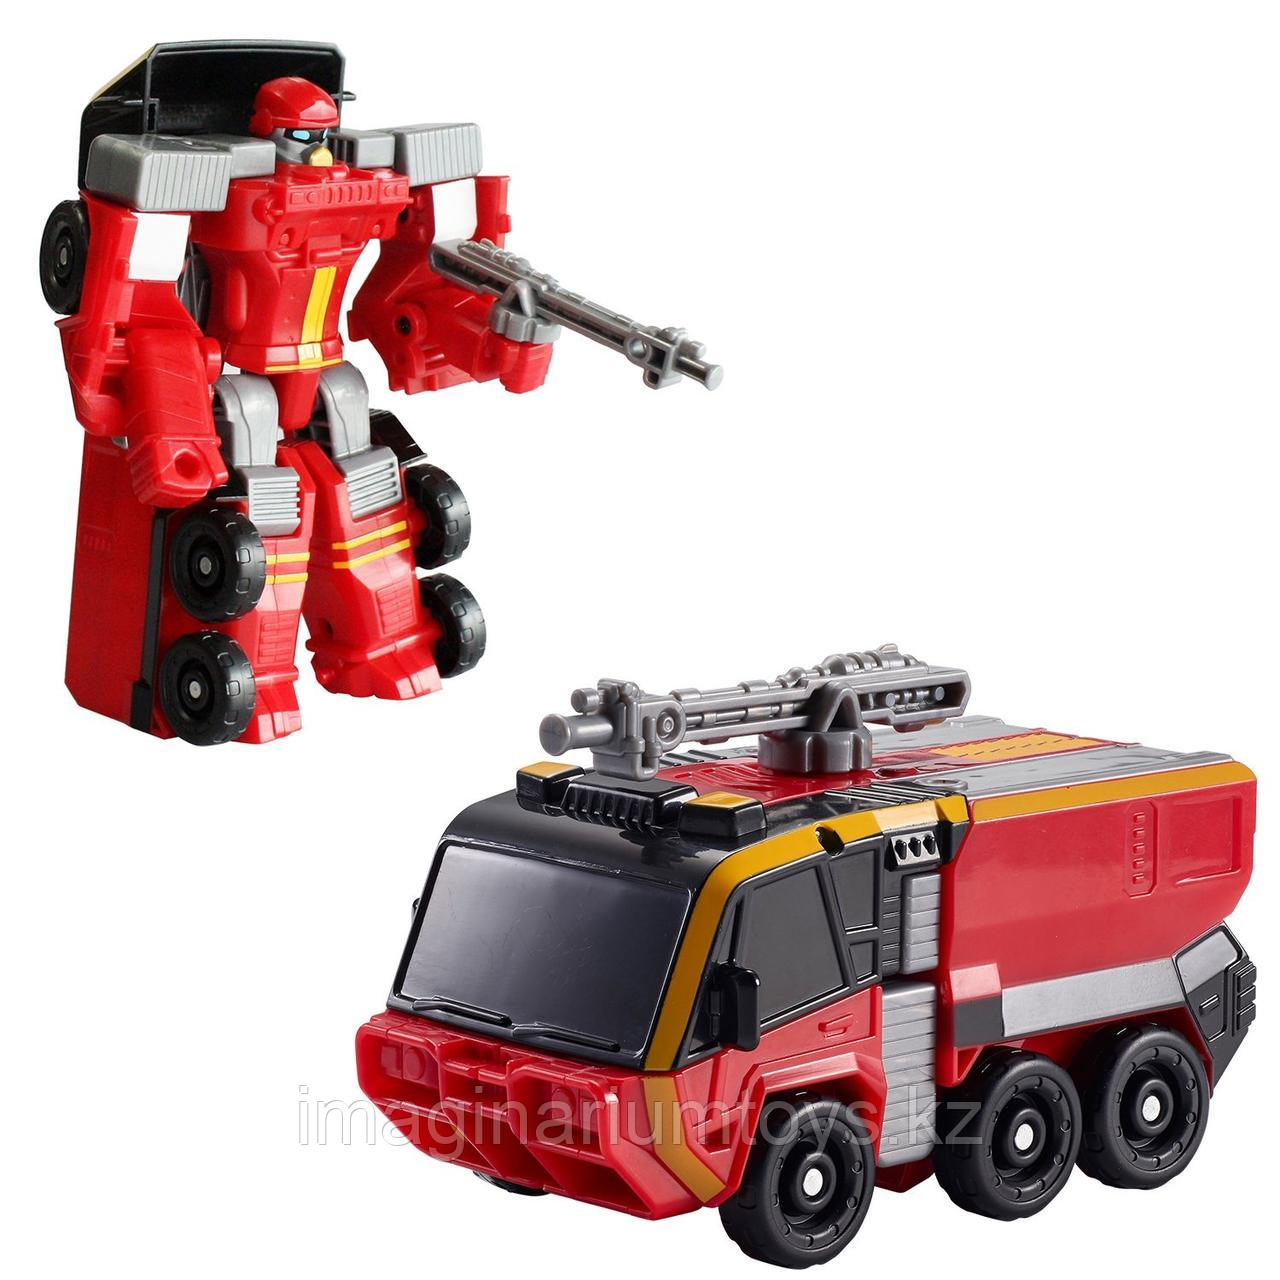 Тобот робот трансформер мини Атлон Вулкан S2